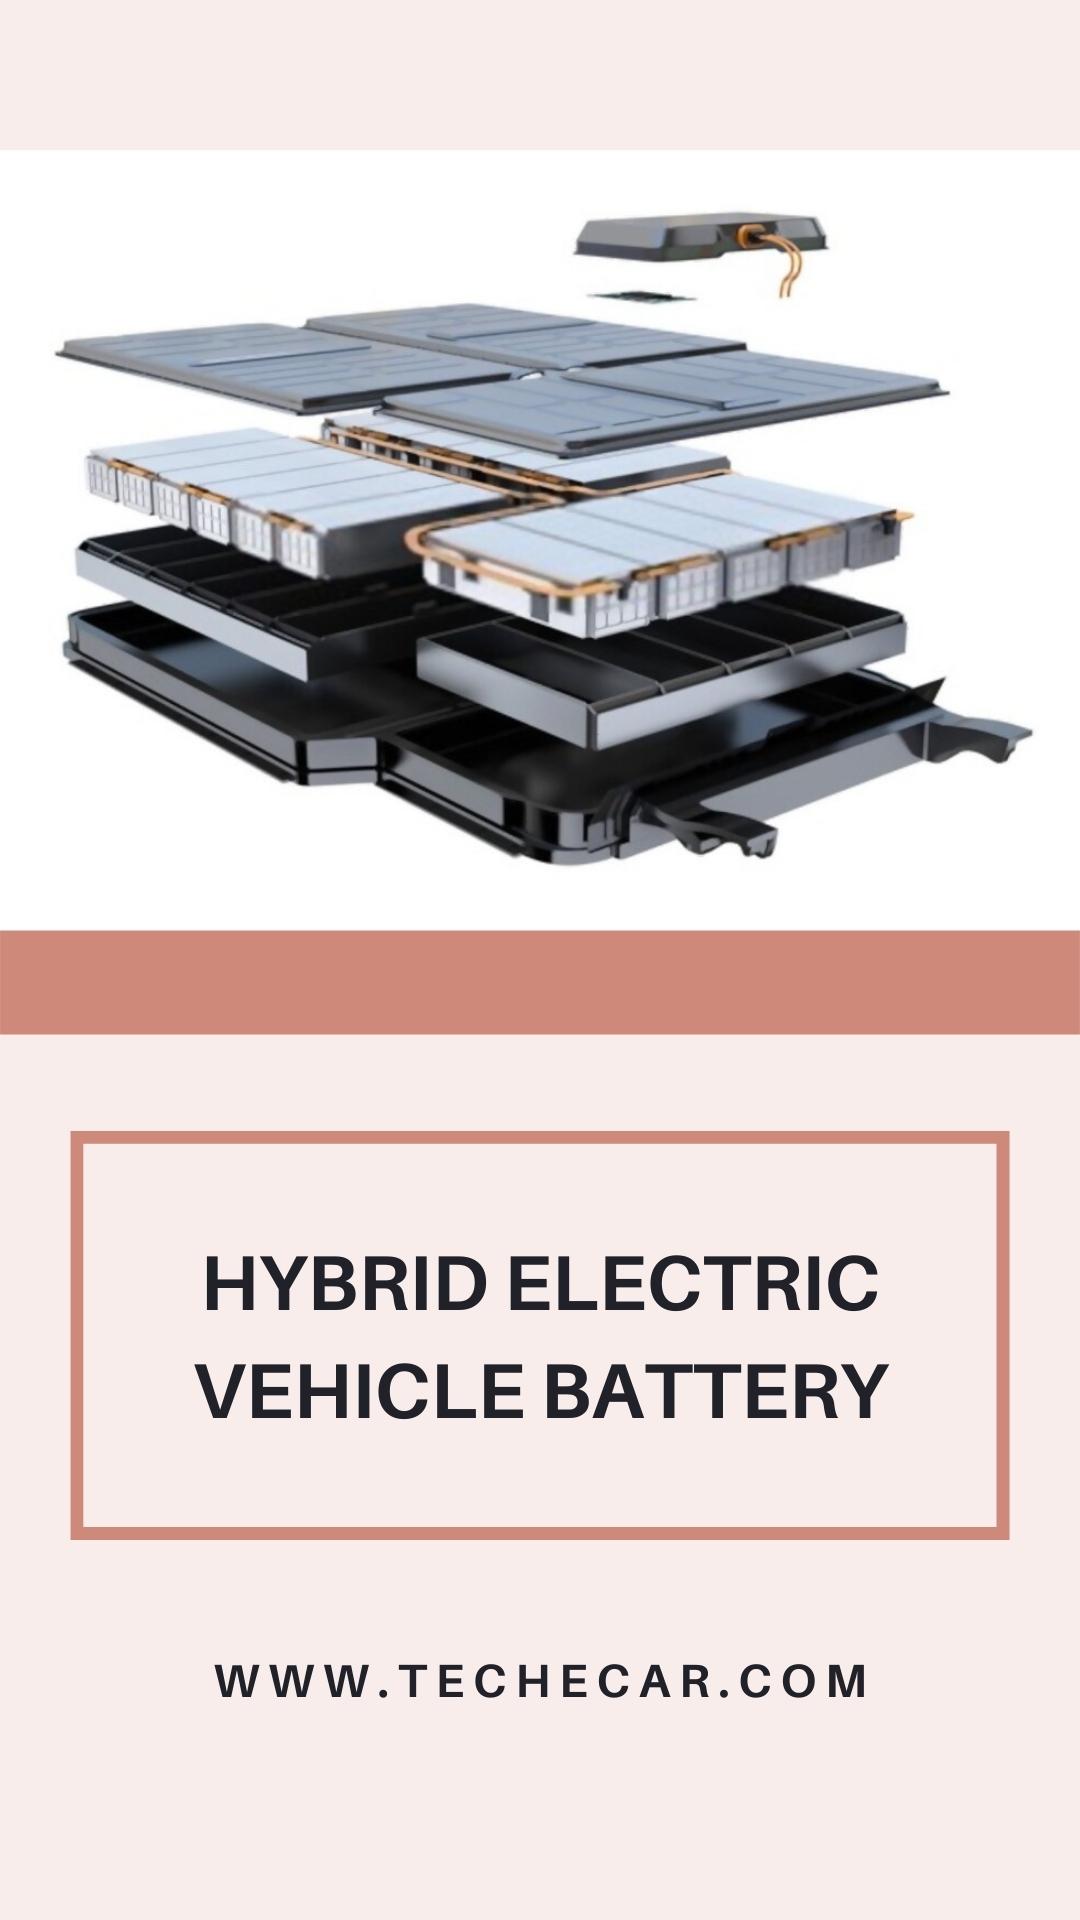 Hybrid Electric Vehicle Battery